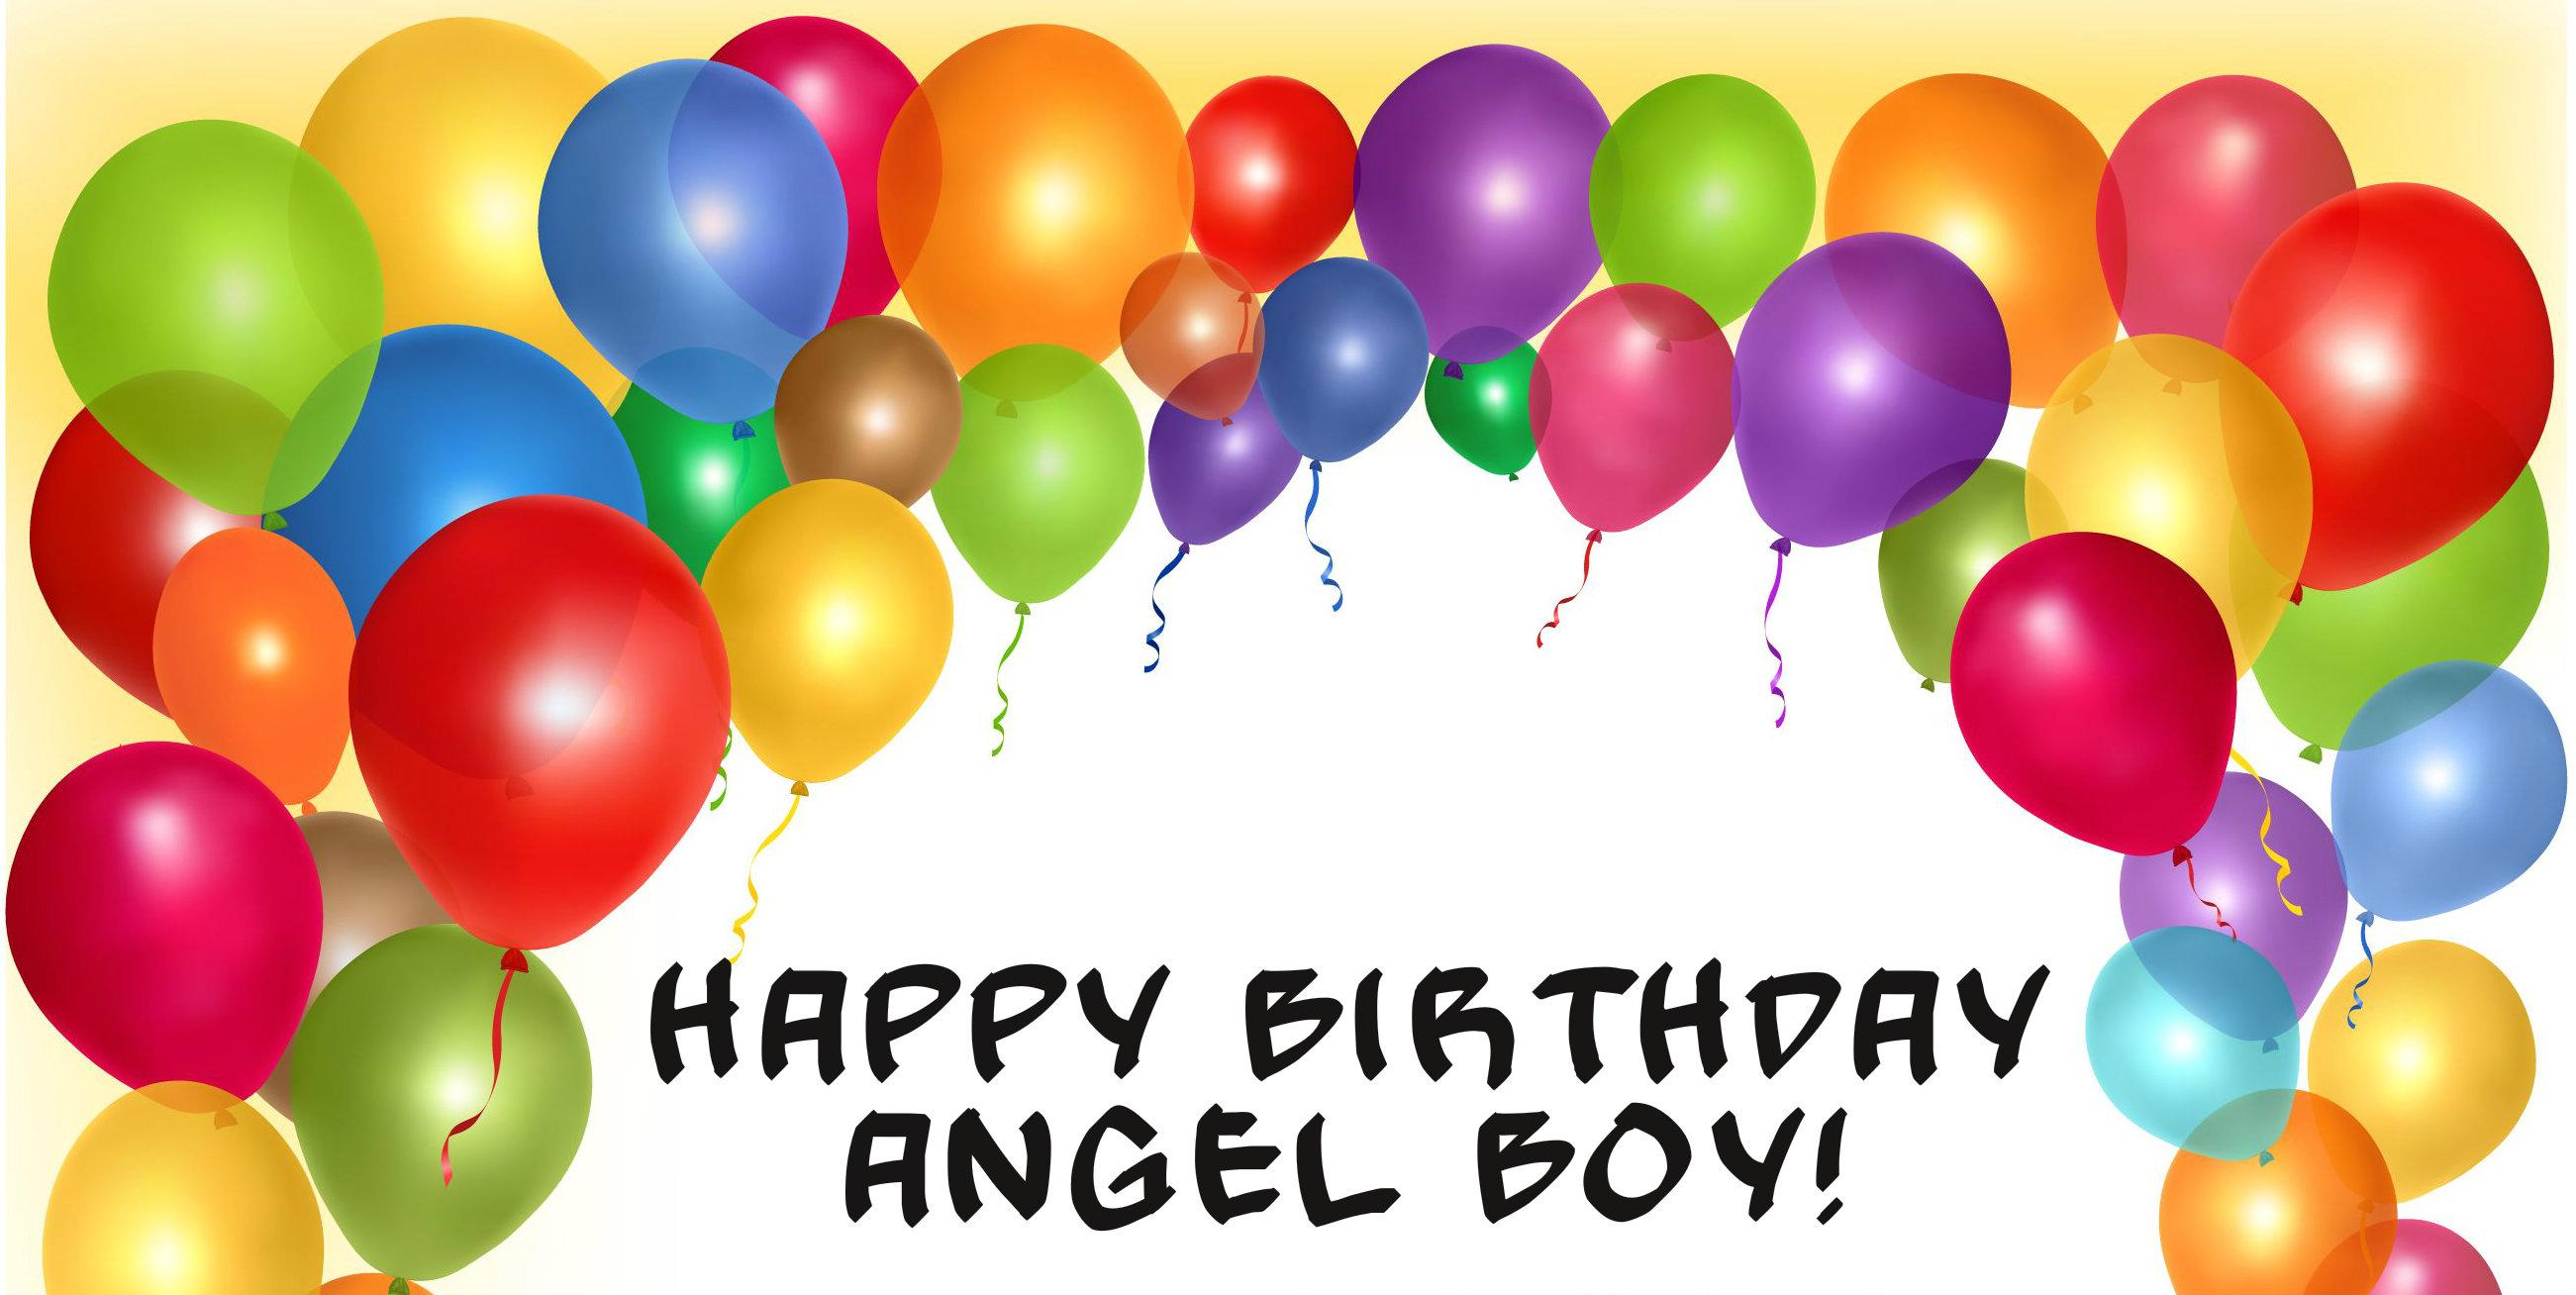 HAPPY BIRTHDAY ANGEL BOY.